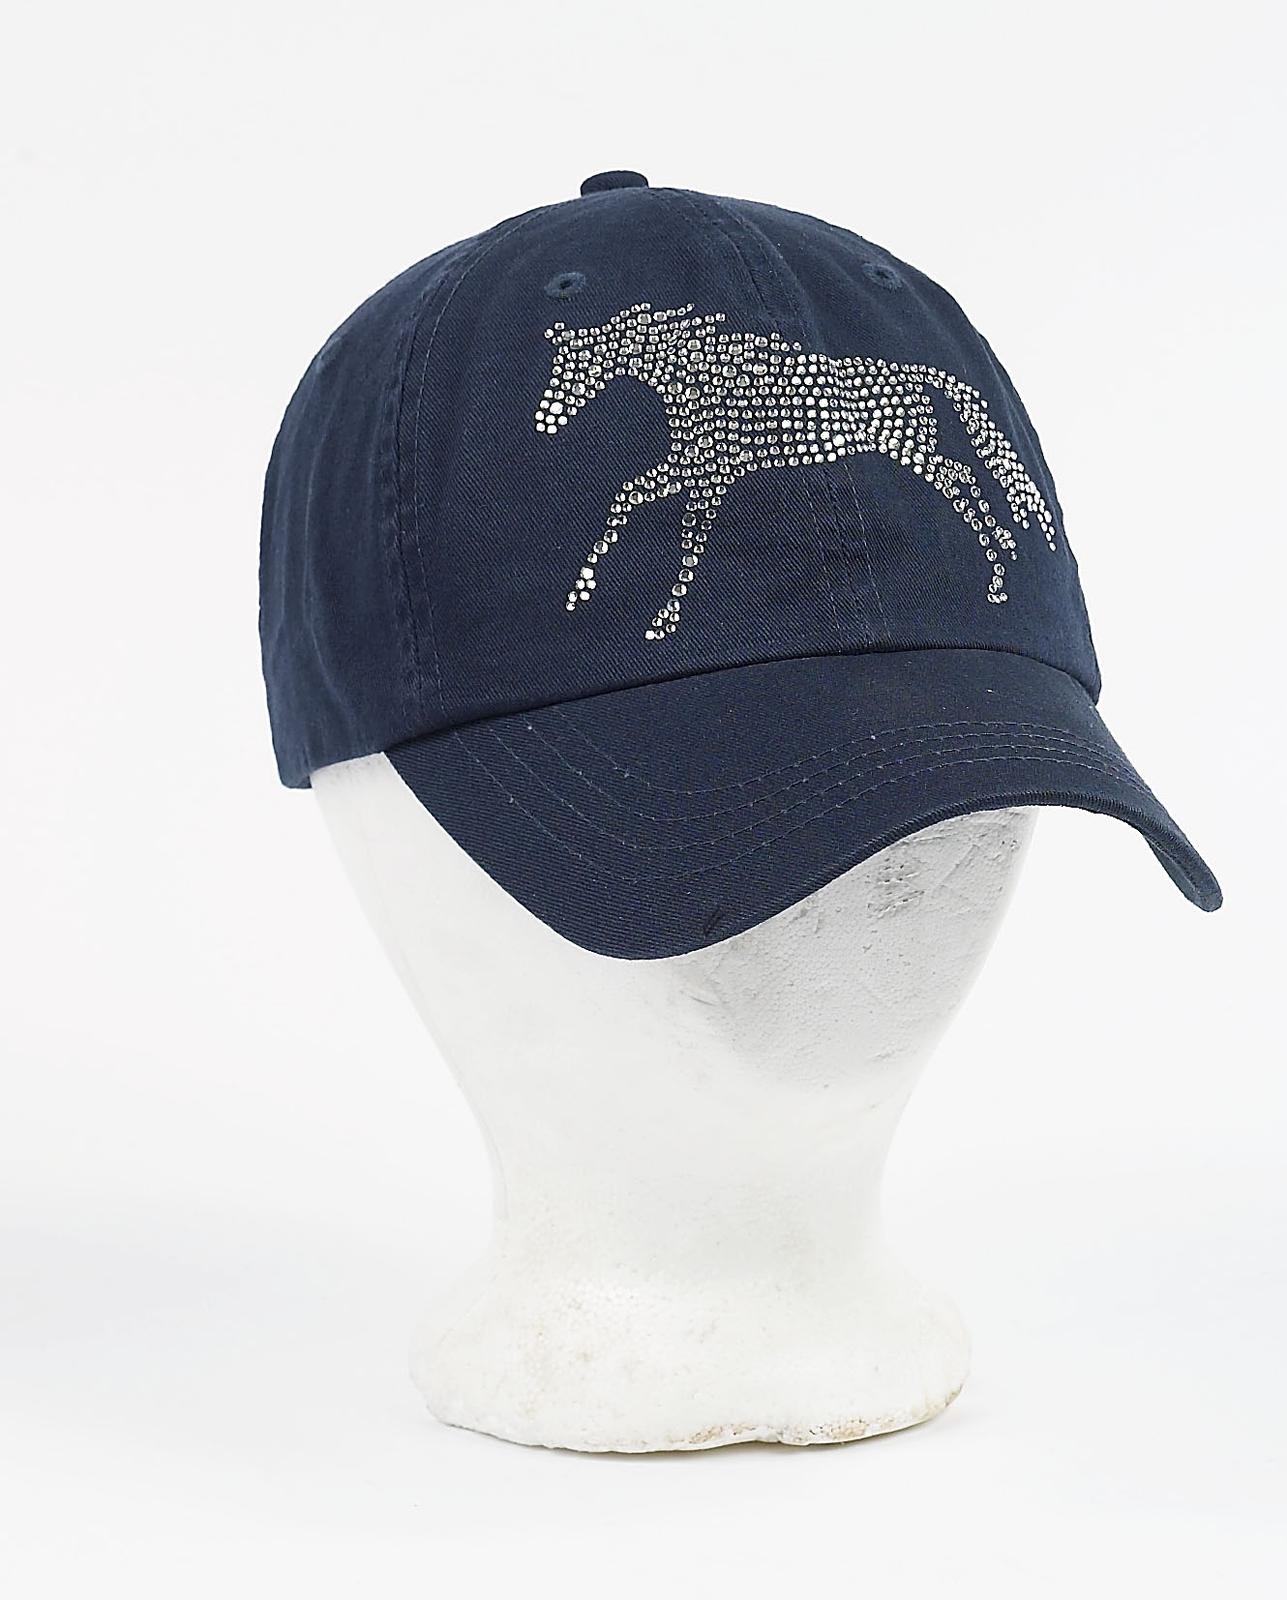 Rhinestone Galloping Horse Cap